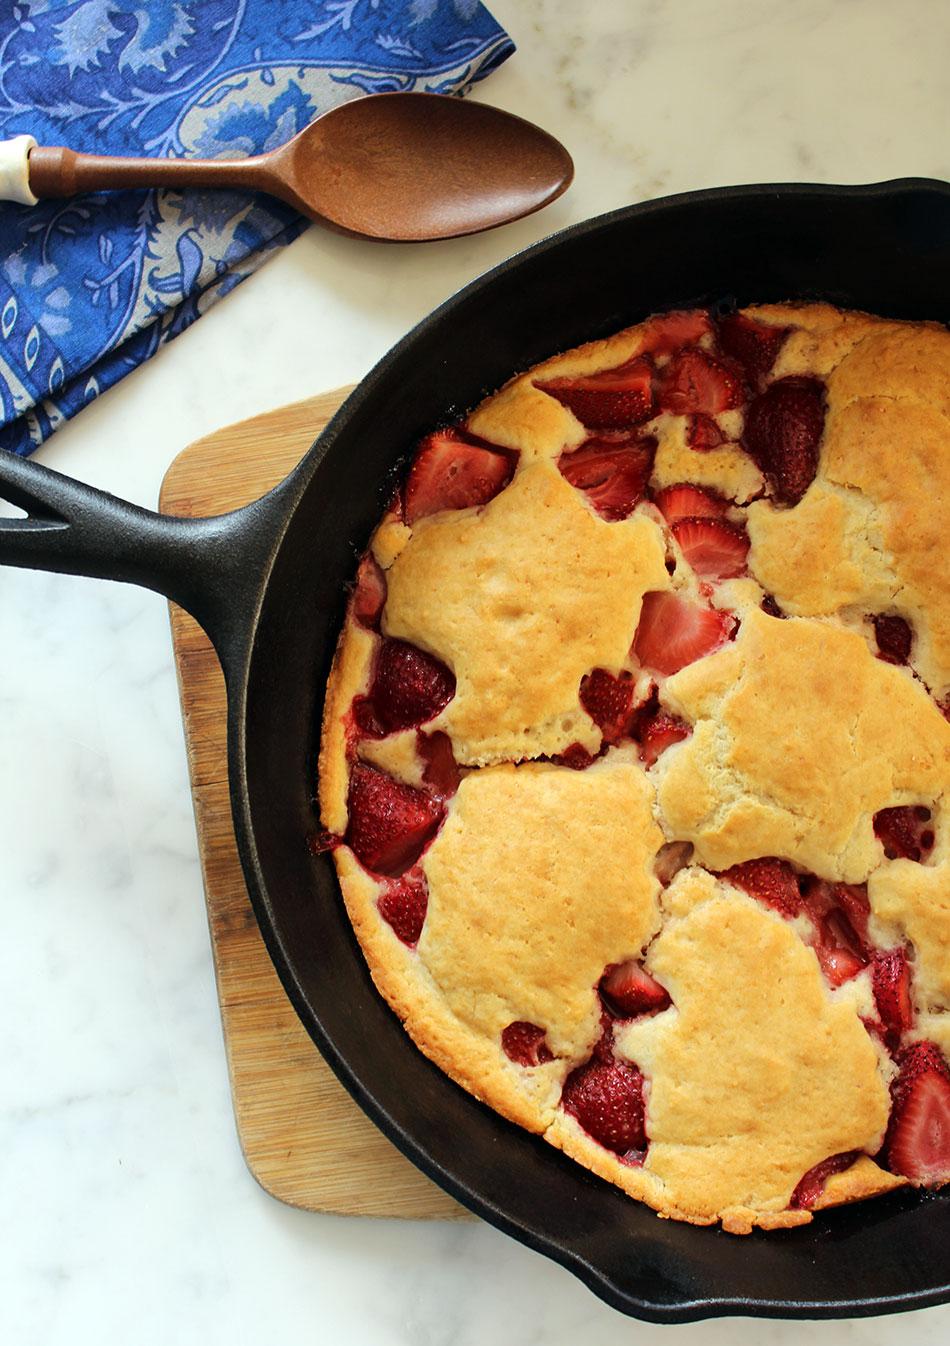 Cast Iron Strawberry Shortcake   Photo + Recipe Contributed by Michelle Lara